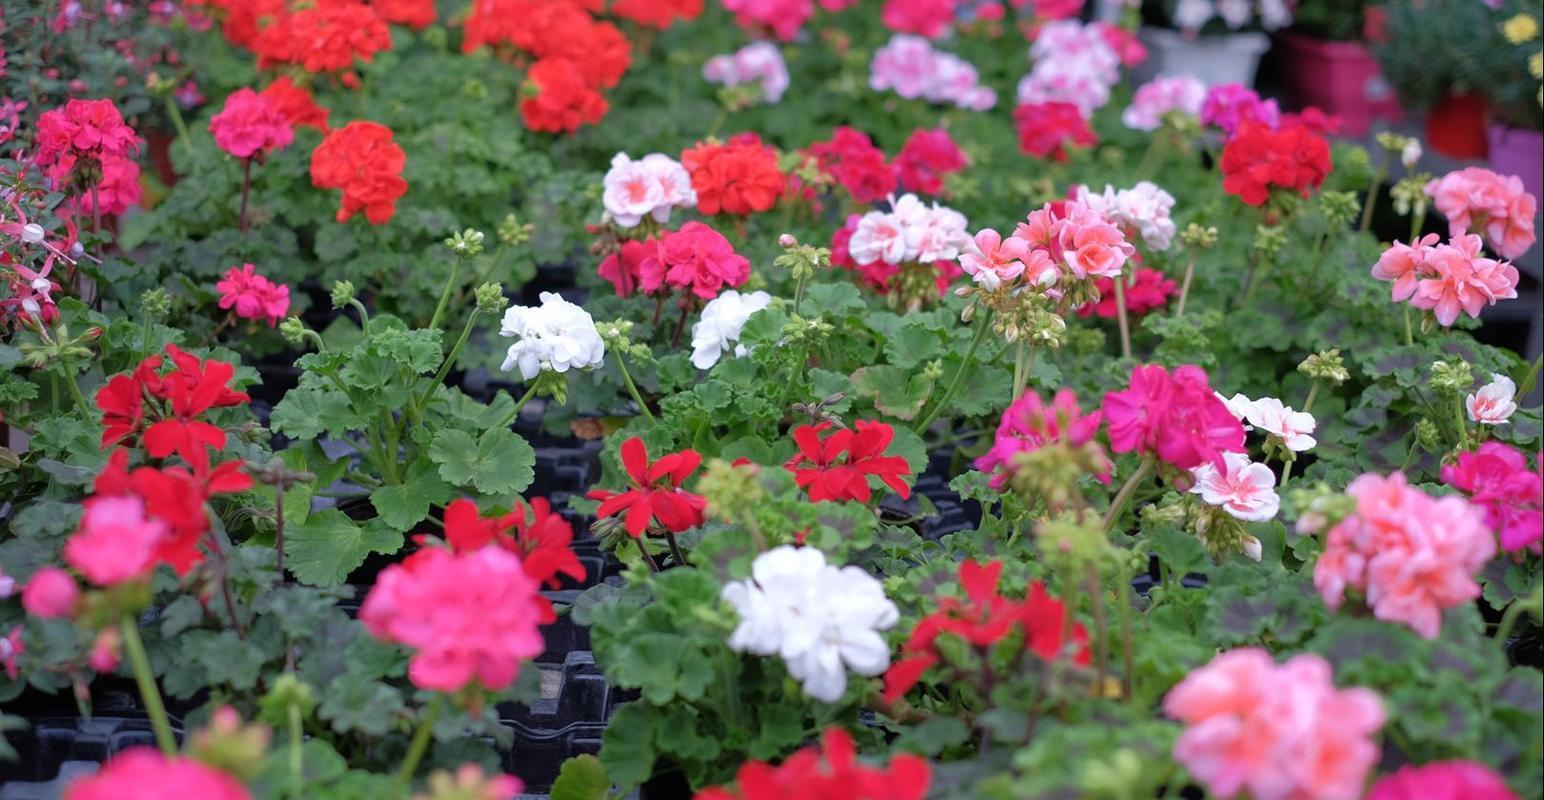 Grossiste fleurs Chambéry, grossiste plantes Chambéry,